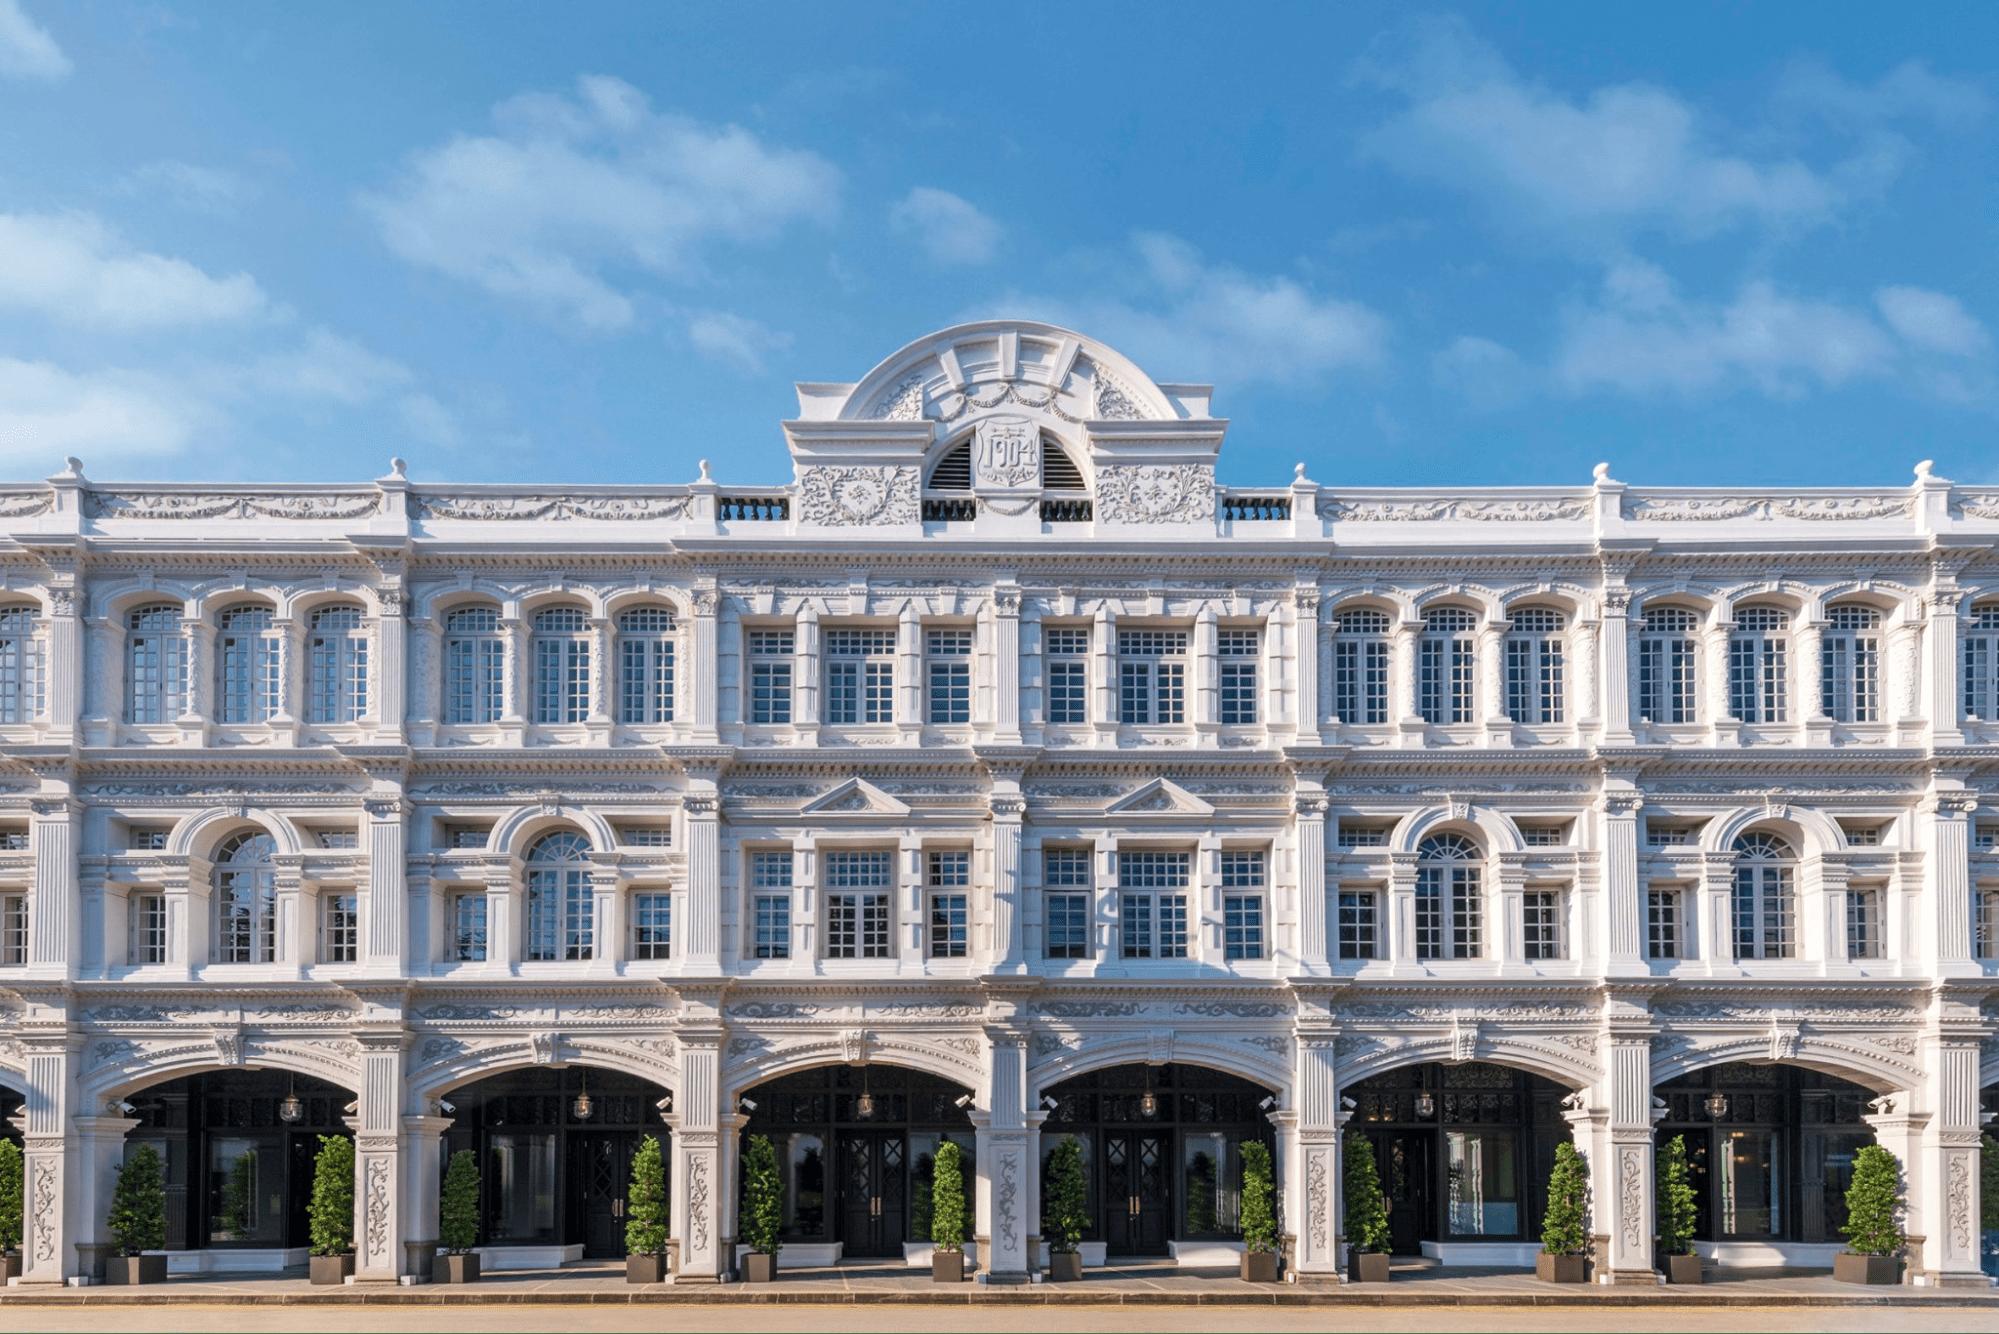 Capitol Kempinski Hotel - Europe in Singapore